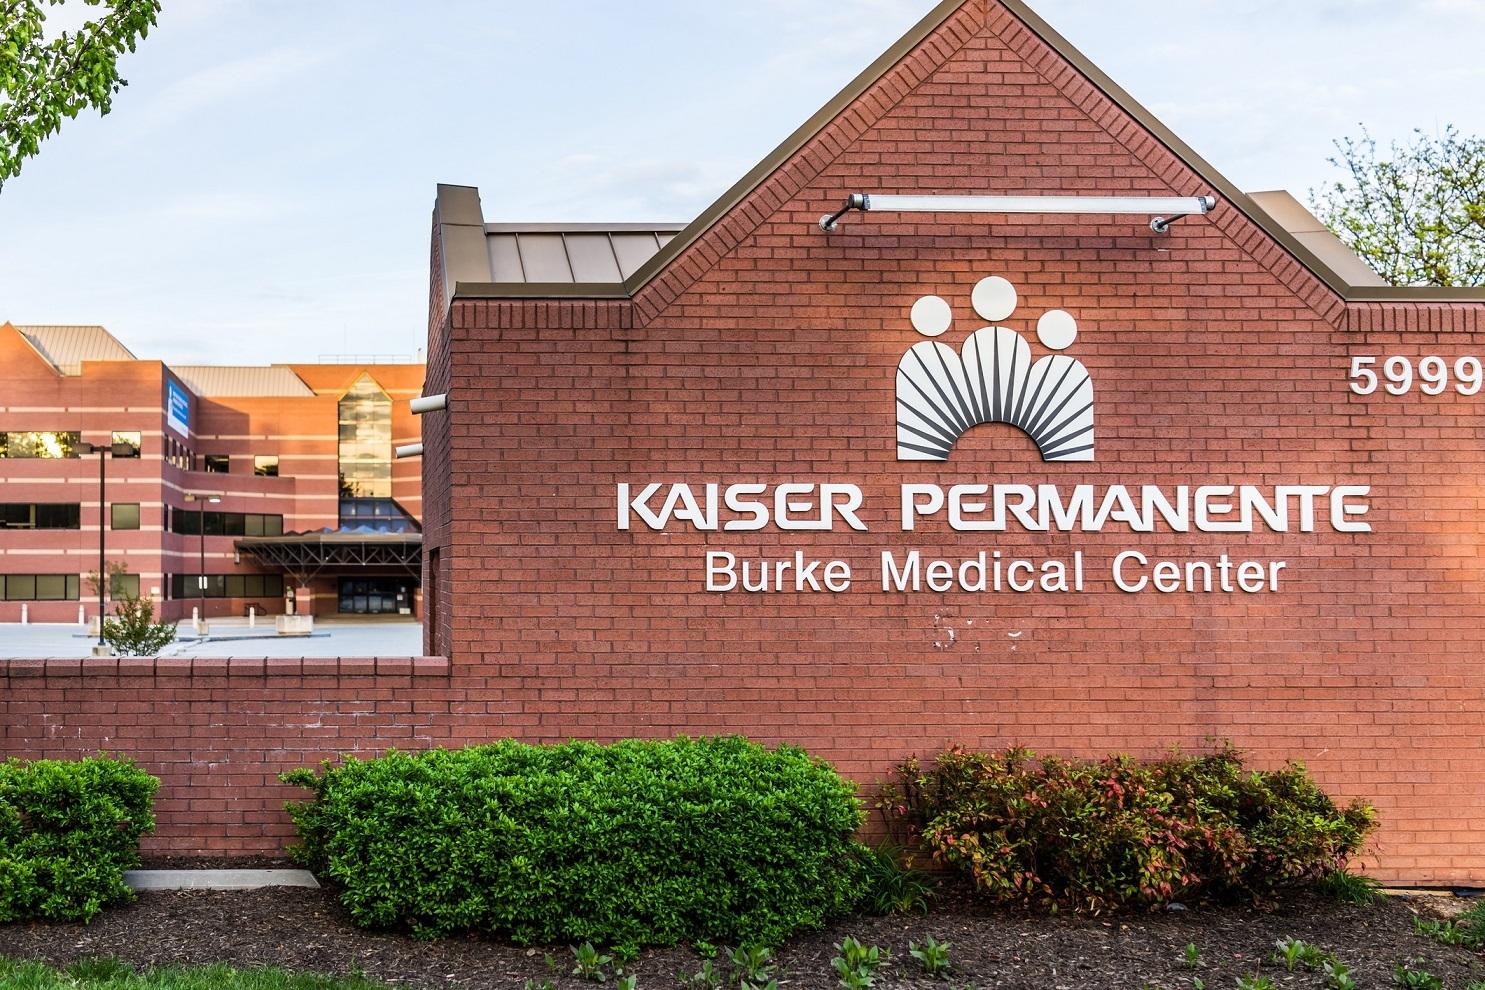 Kaiser Permanente at Burke Medical Center sign on brick wall